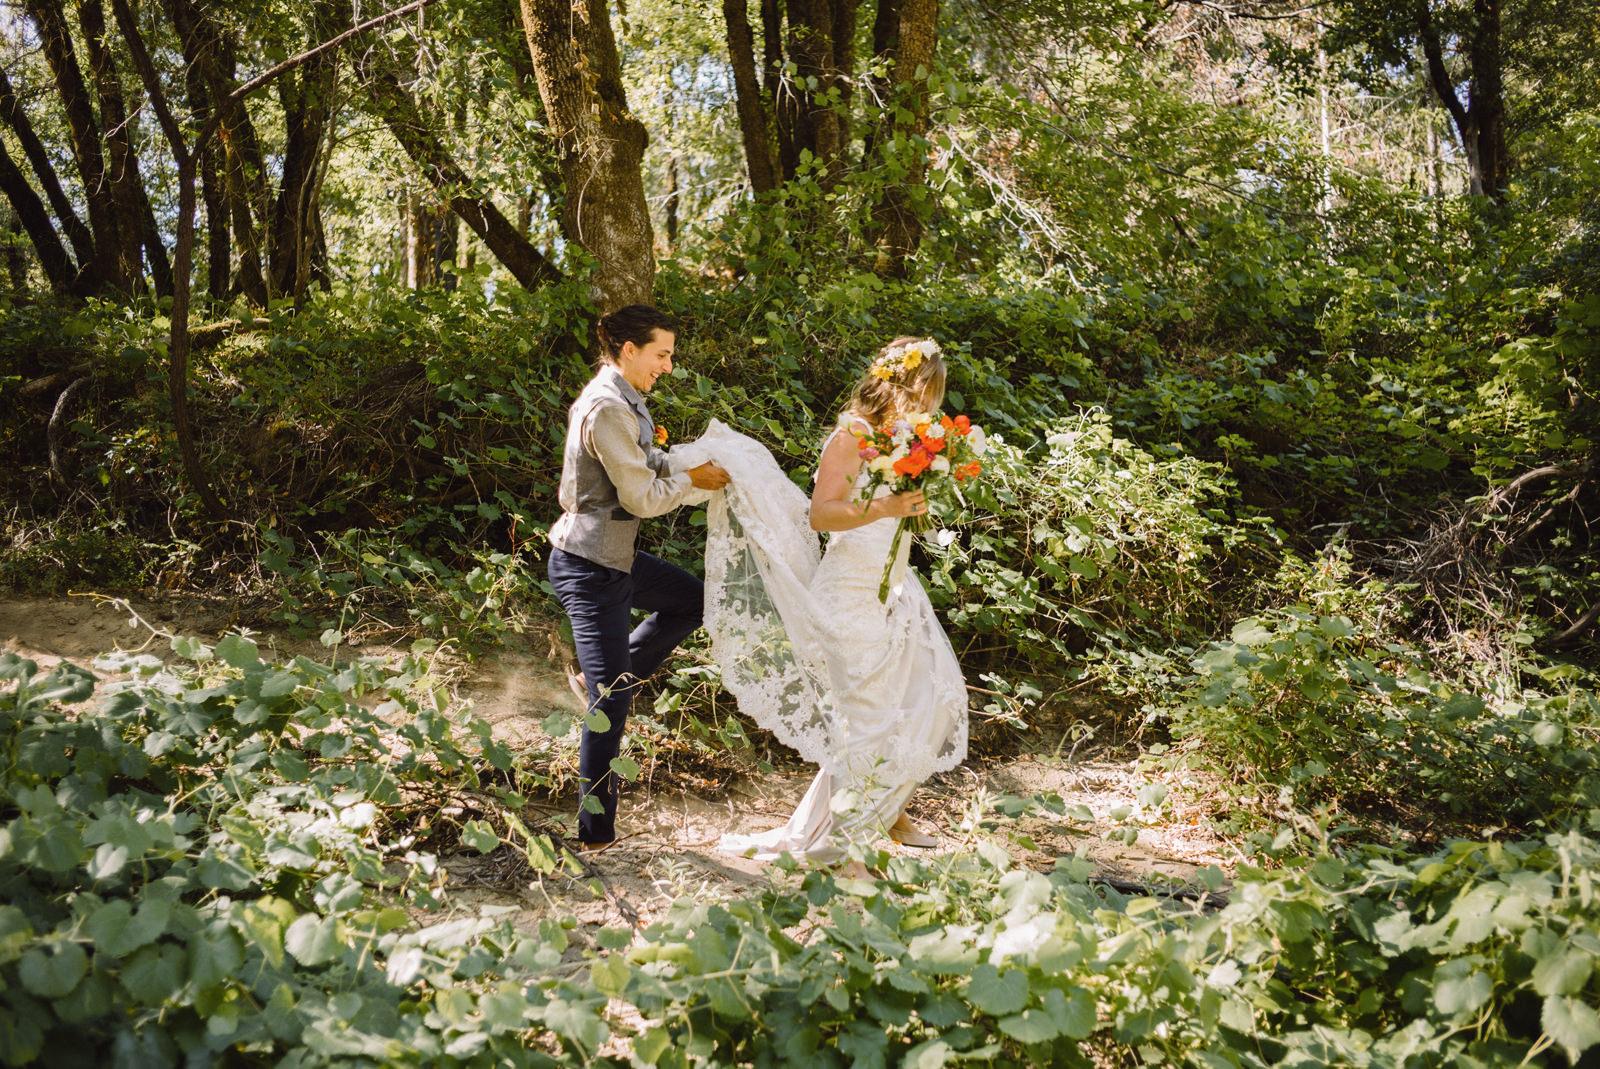 rivers-bend-retreat-wedding-050 RIVER'S BEND RETREAT WEDDING